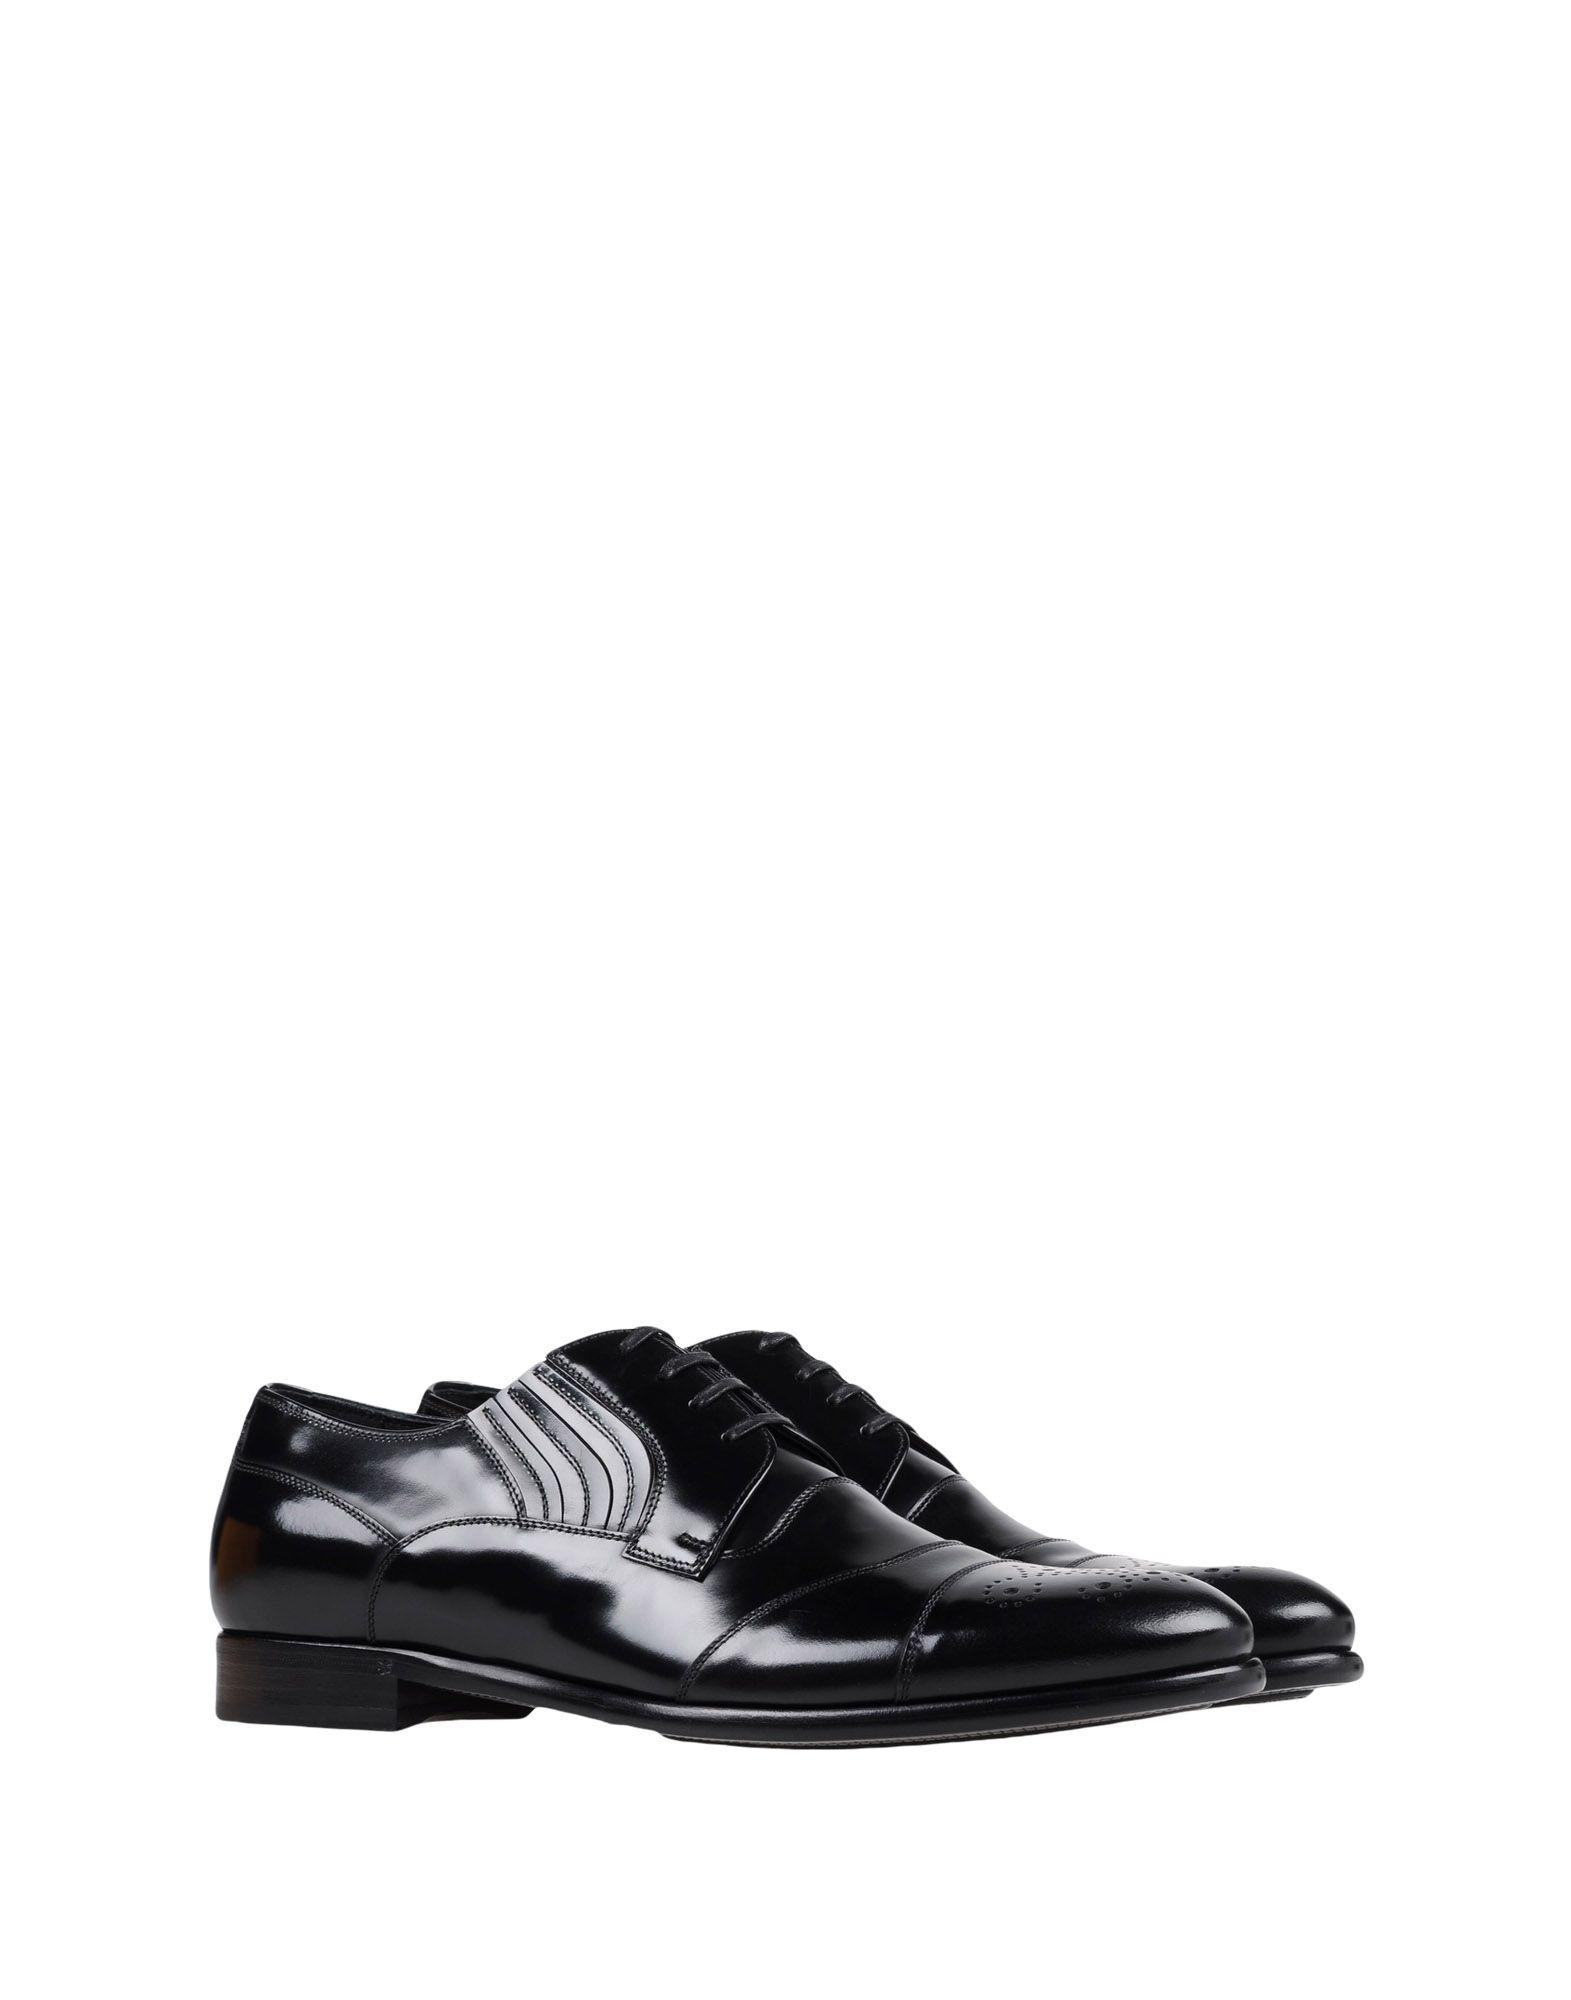 Dolce & Gabbana Schnürschuhe Herren  11367985WP 11367985WP 11367985WP Gute Qualität beliebte Schuhe 5cb168